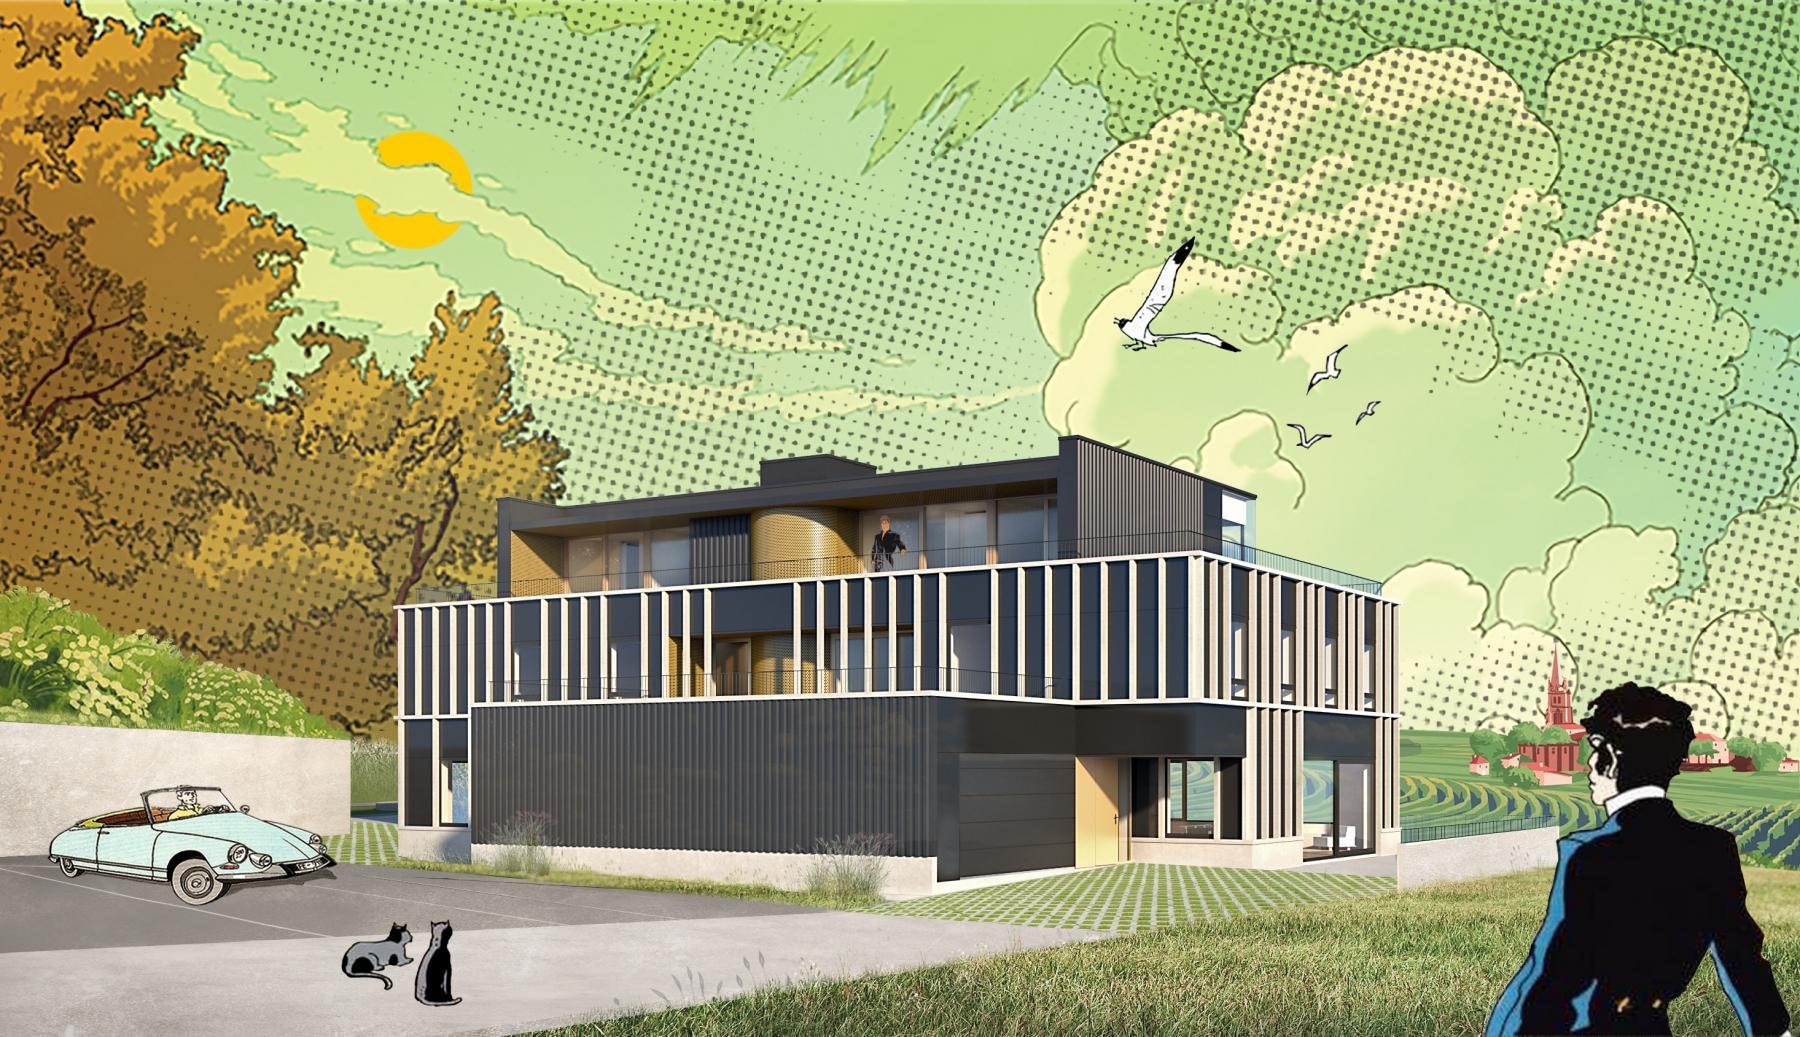 1_200612_Perspective_avant_GS-02